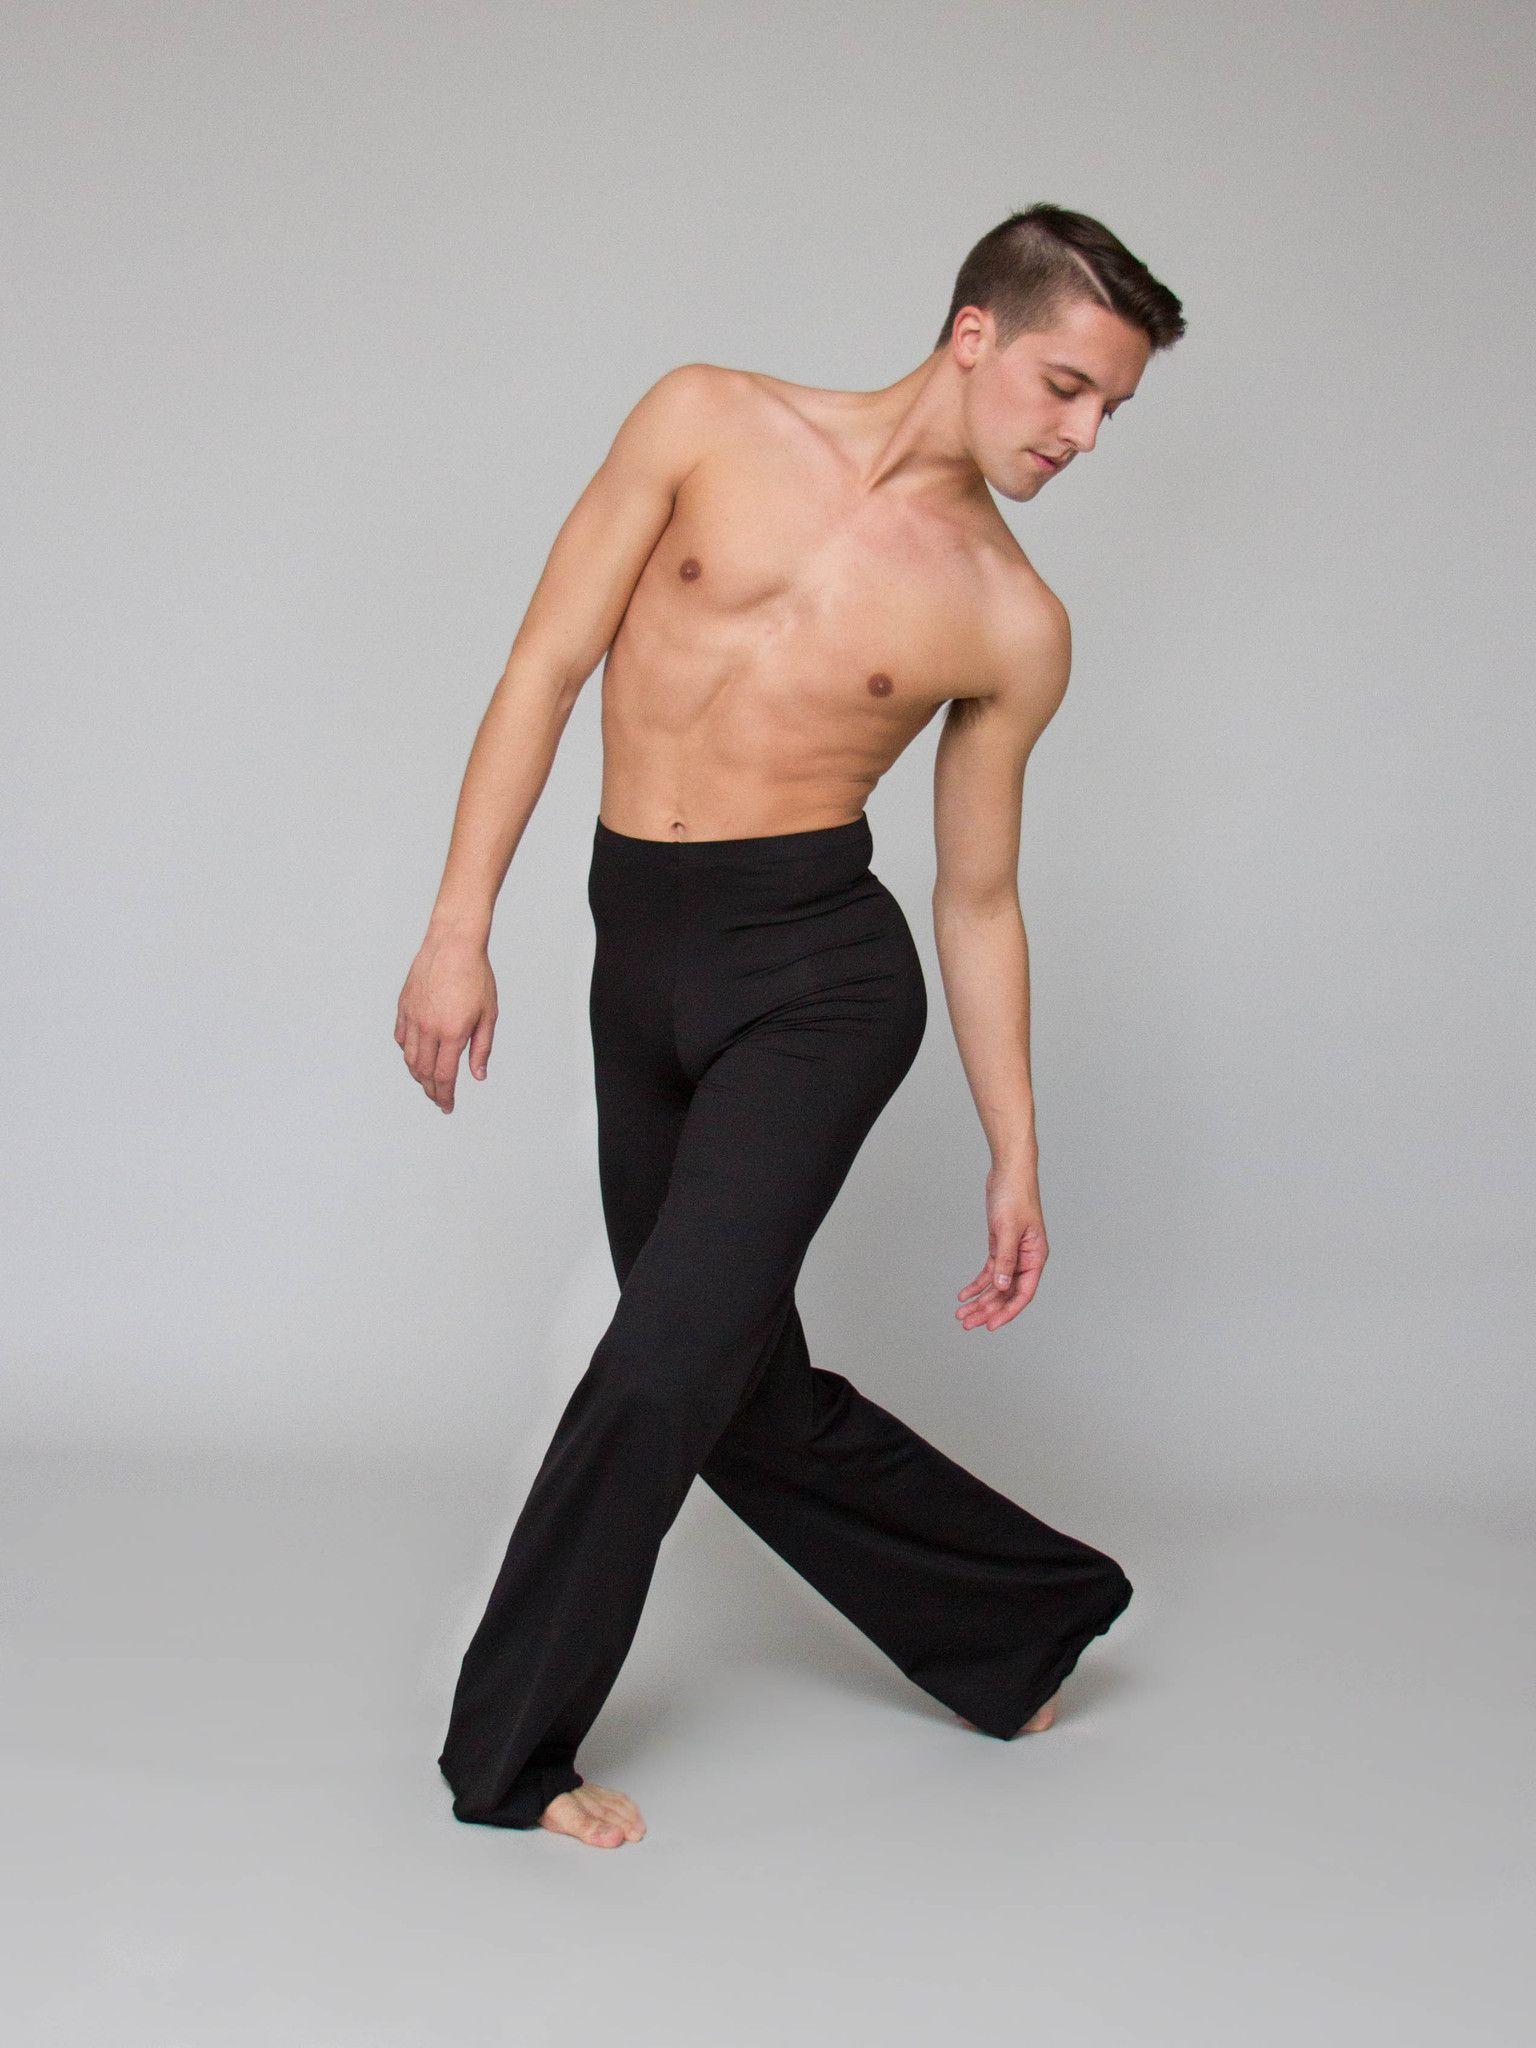 fa3b5fa5163c mens and boys dancewear - jazz pants for men | boysdancetoo. - the dance  store for men